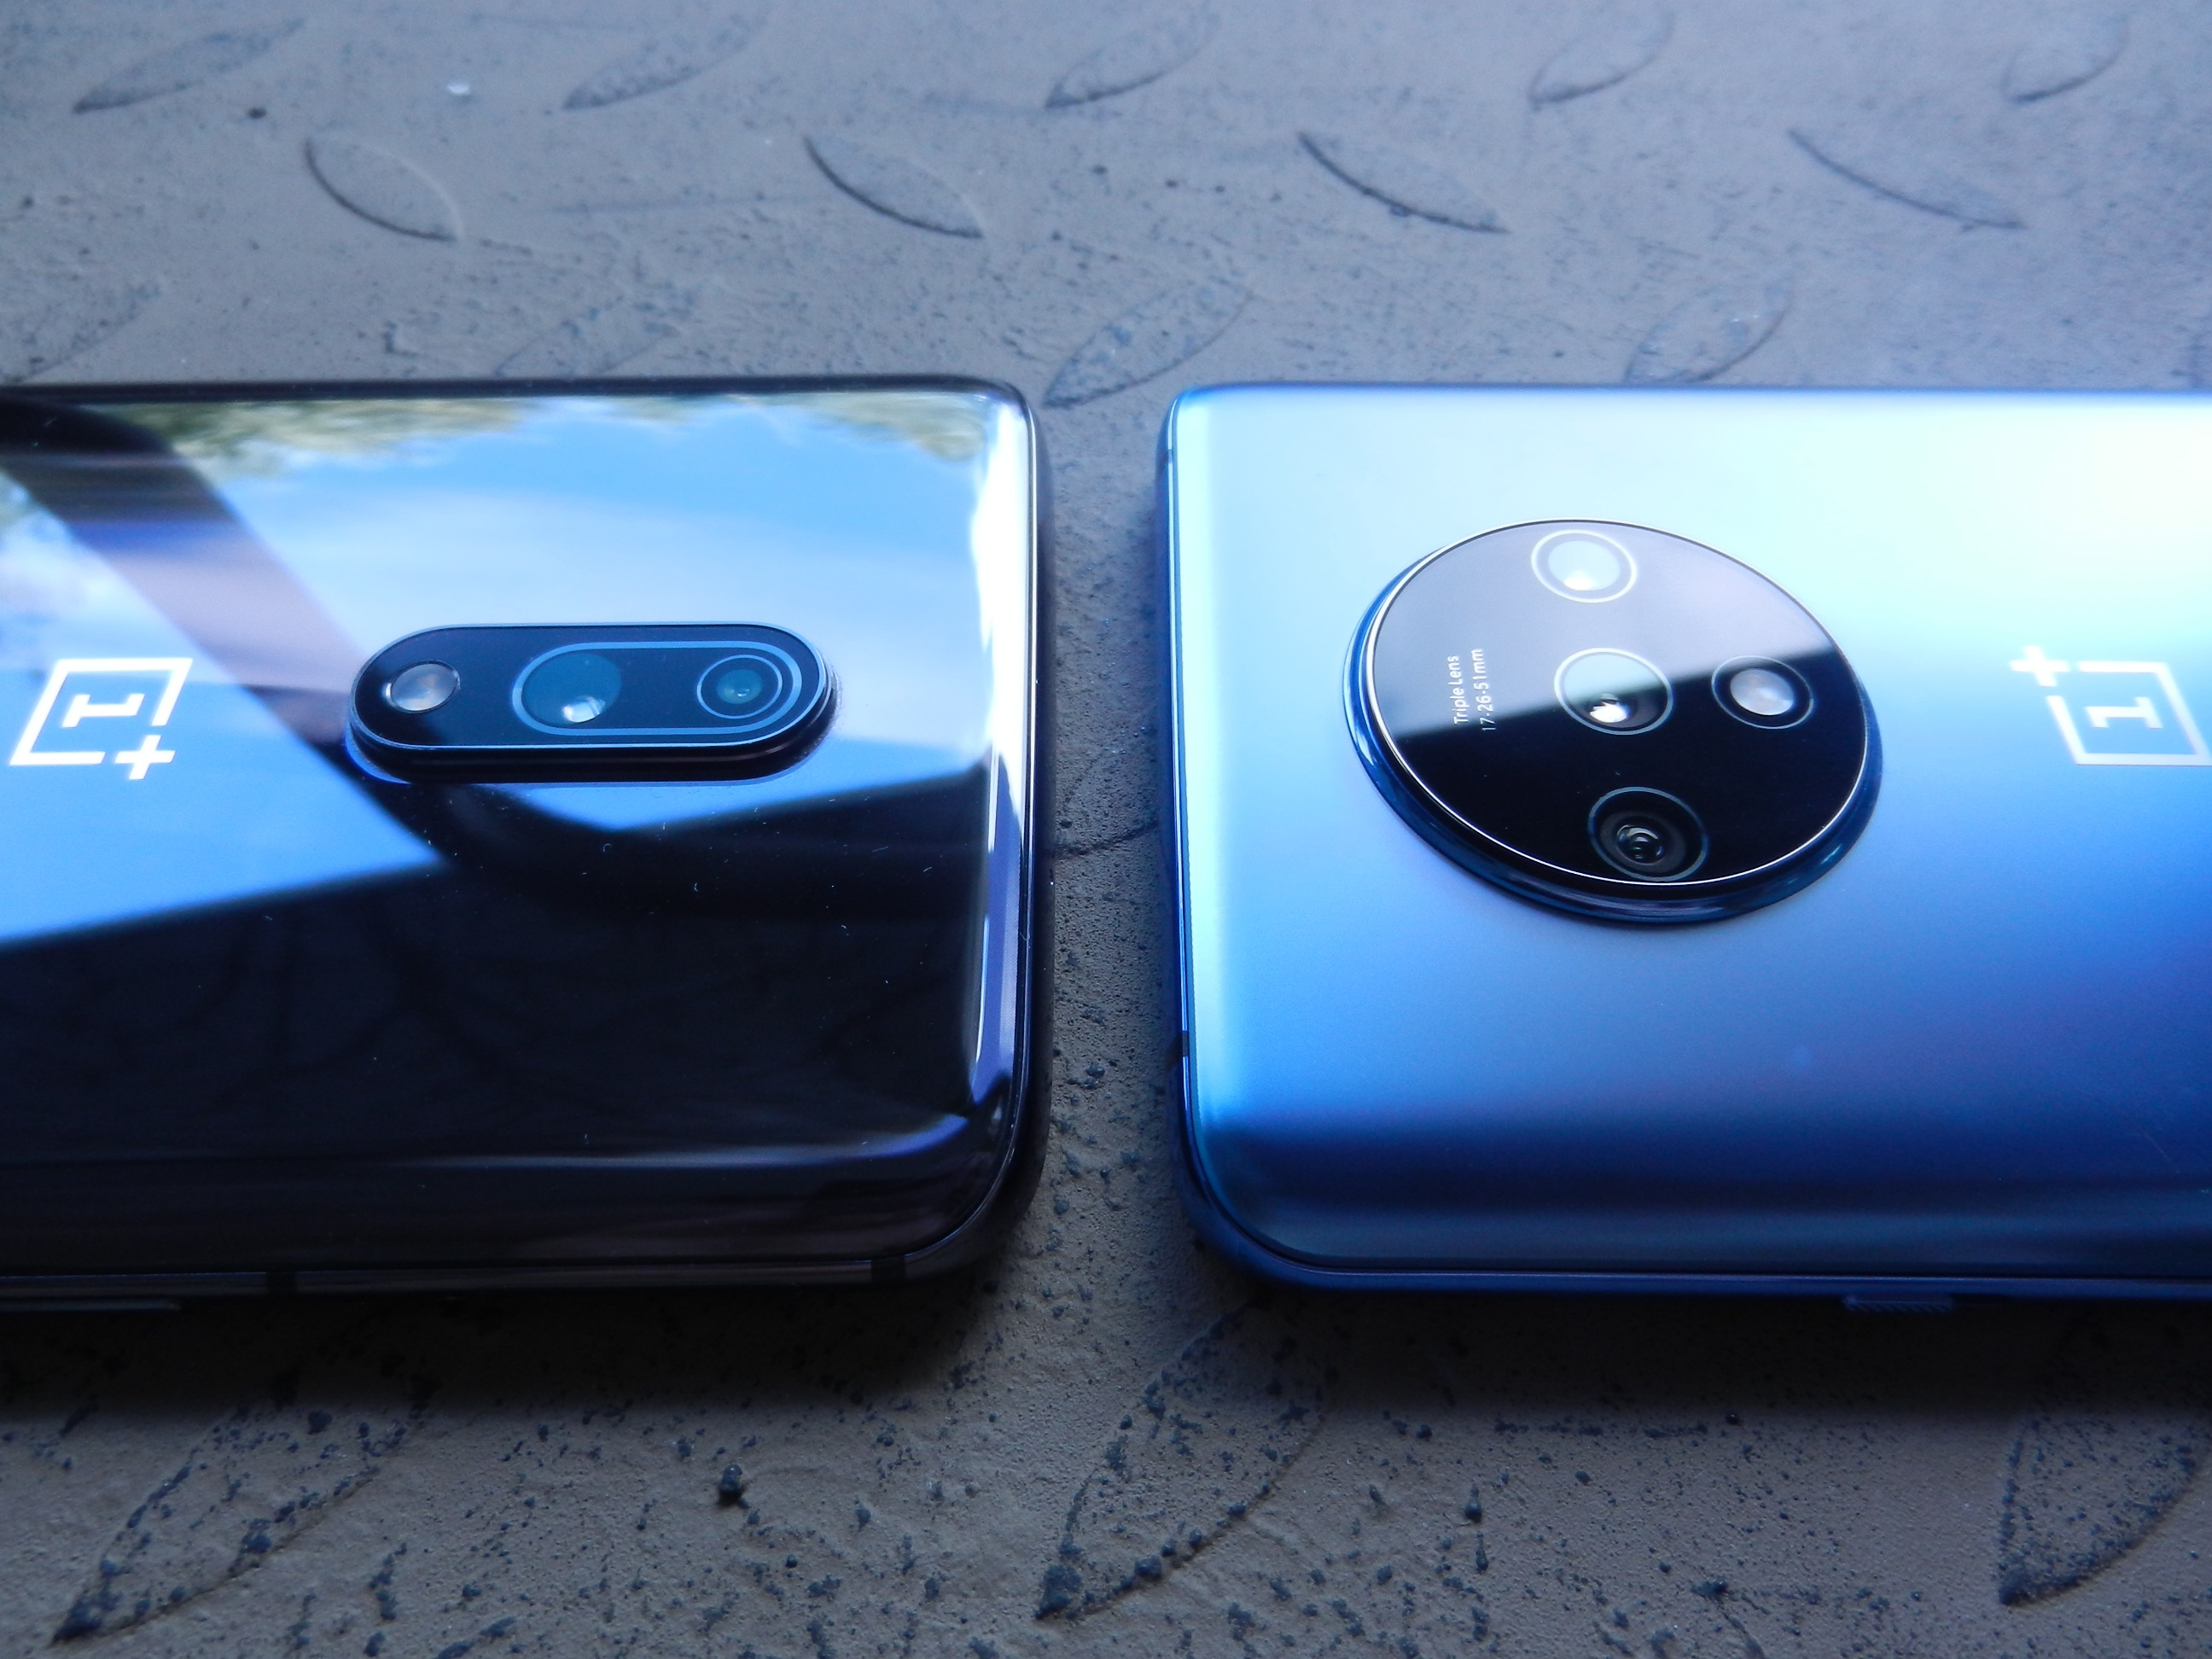 OnePlus 7 vs OnePlus 7T